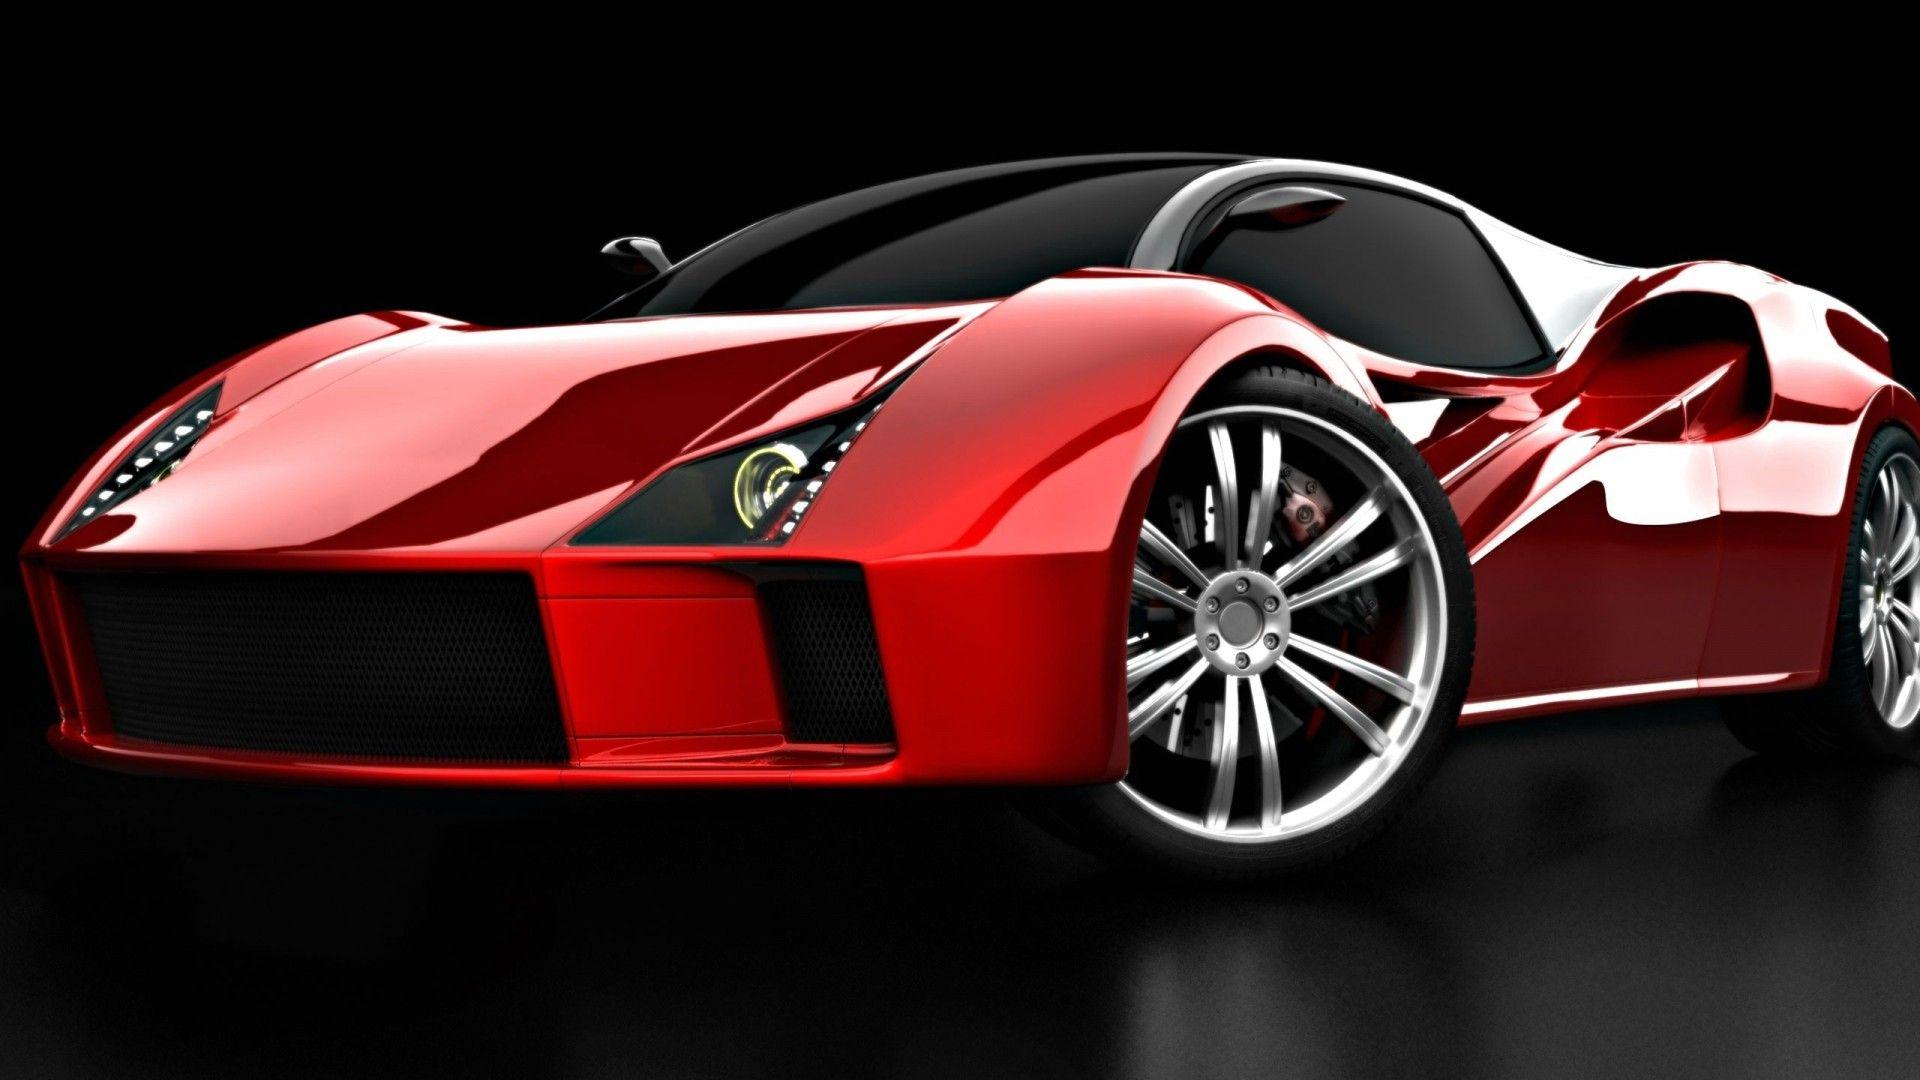 ferrari-hd-cars-cars | Super Car | Pinterest | Car loans, Super cars